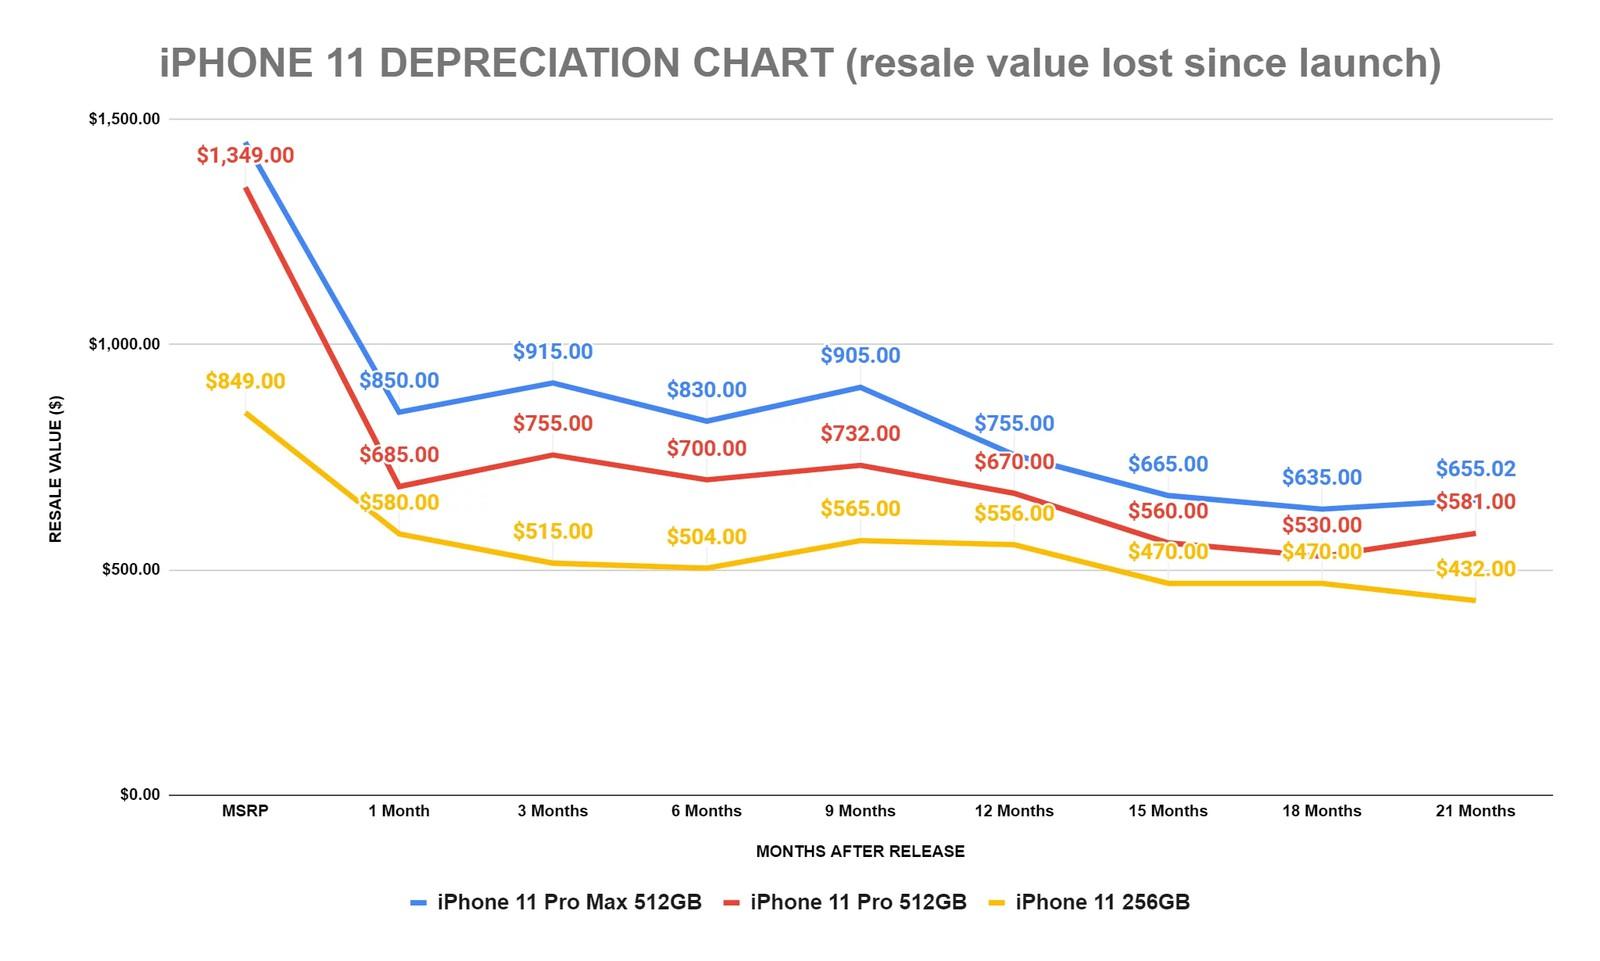 iPhone 11 waarde ontwikkeling